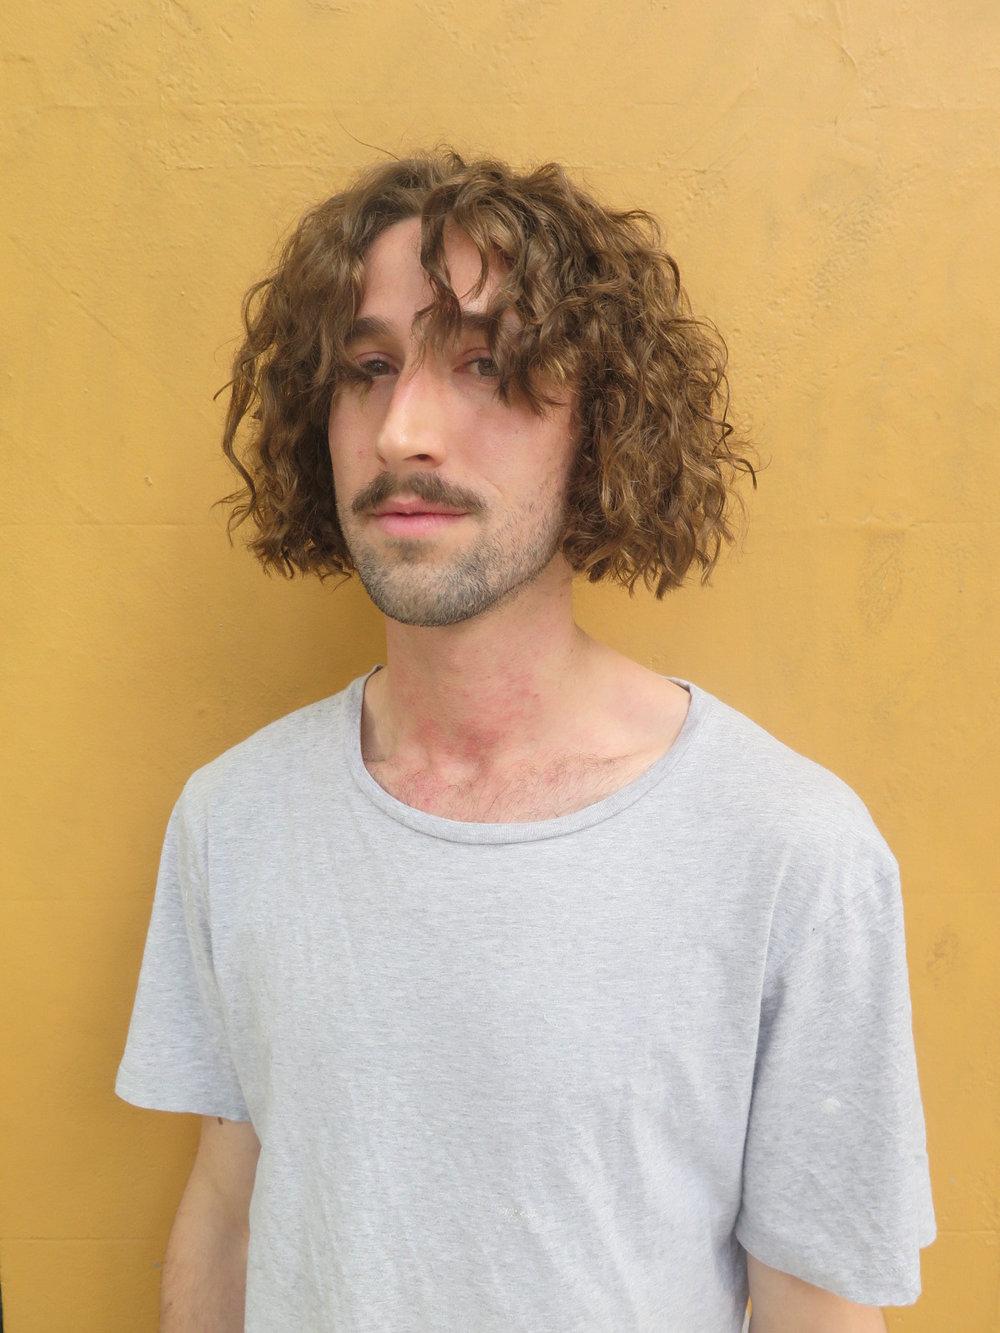 'Man bob' on curls